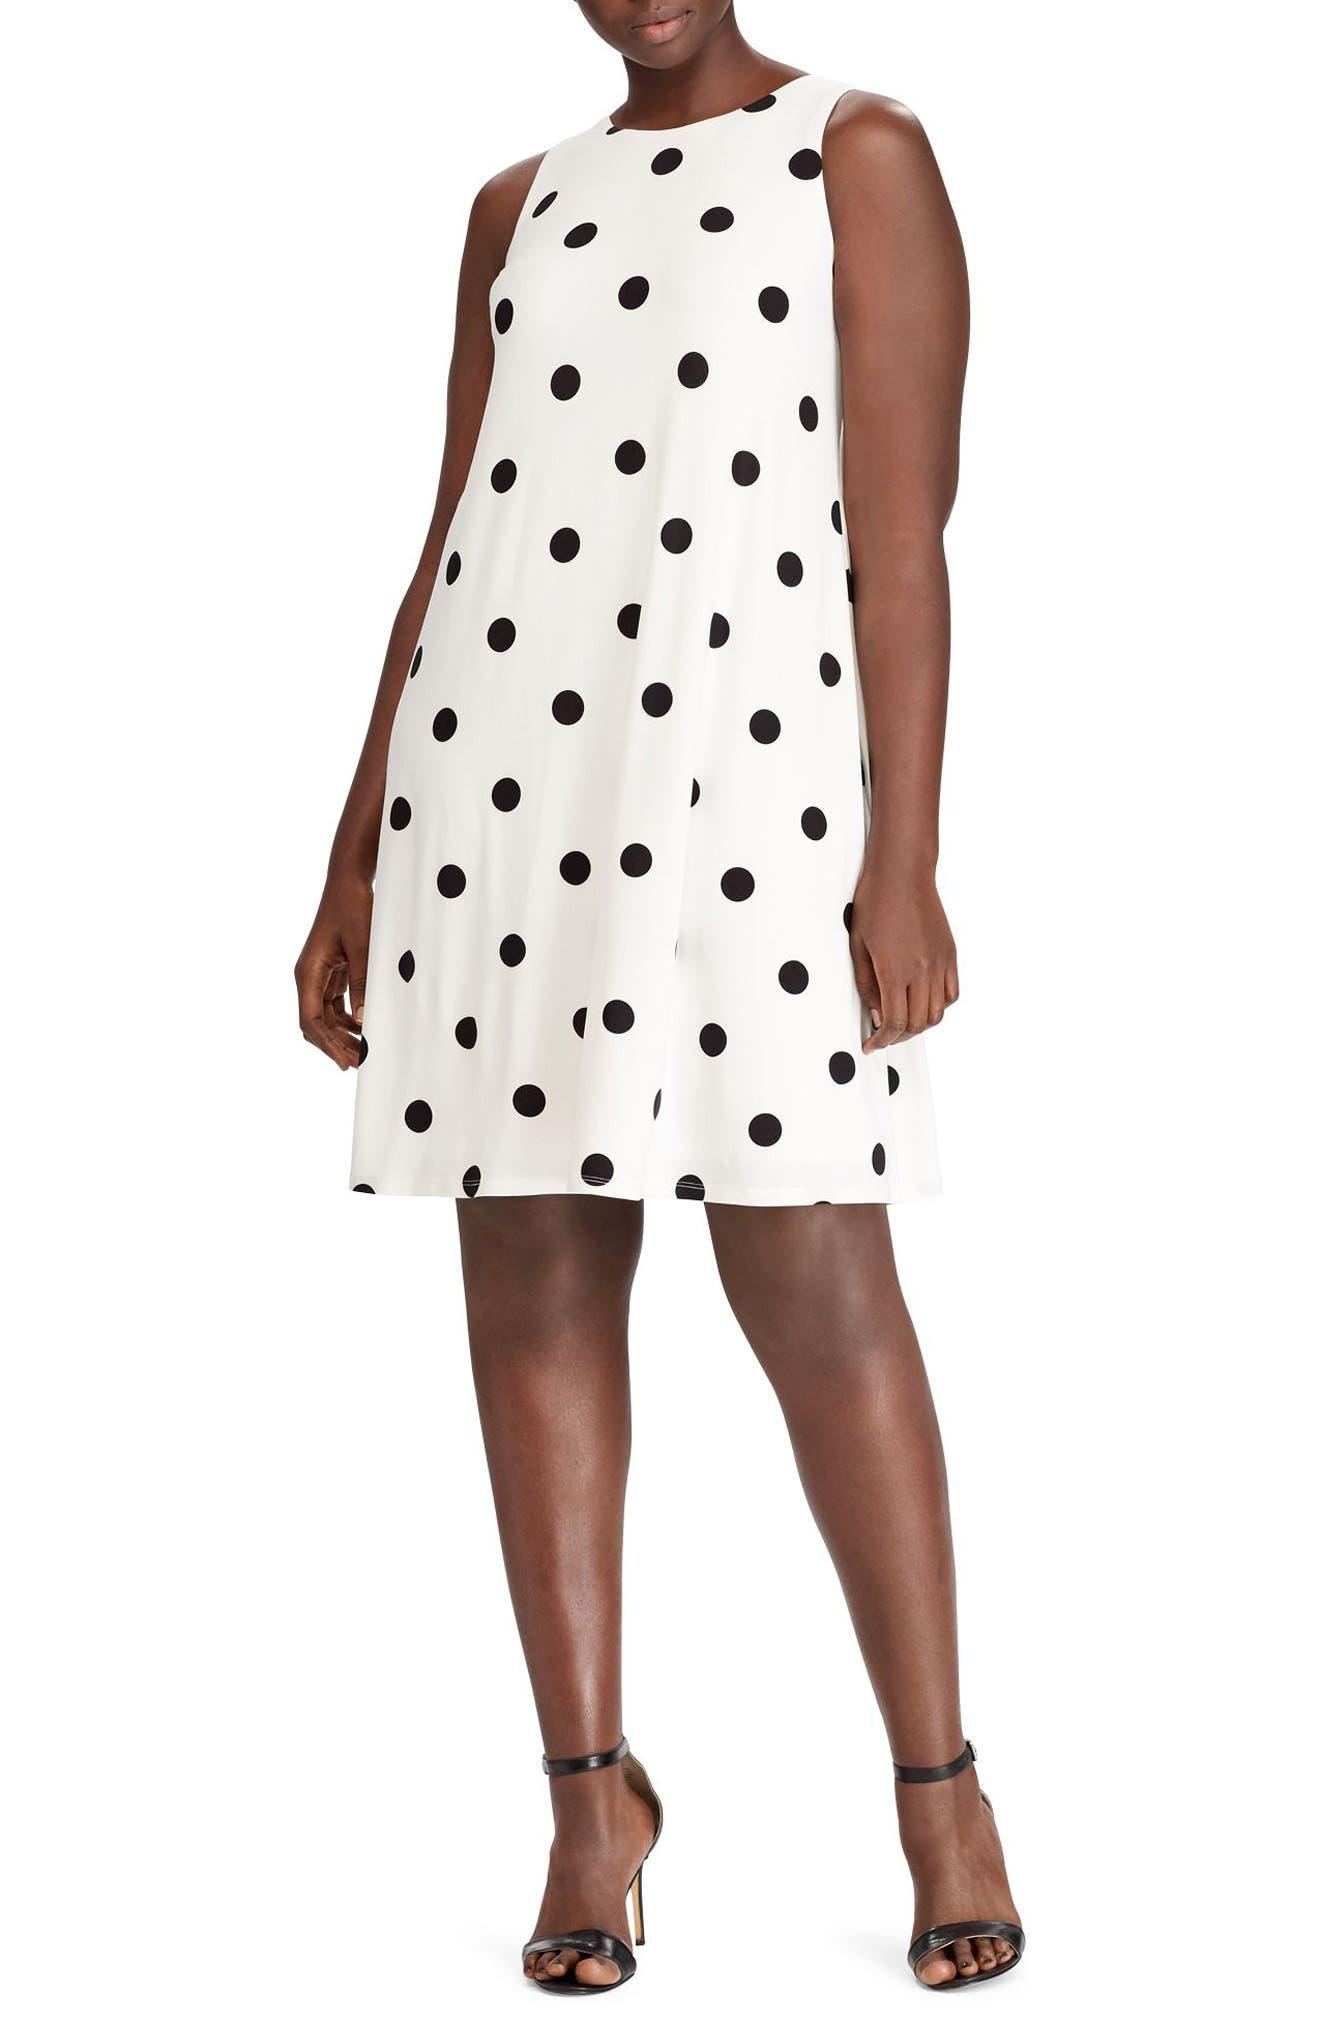 Peninsula Dot A-Line Dress,                             Main thumbnail 1, color,                             Col. Cream-Black